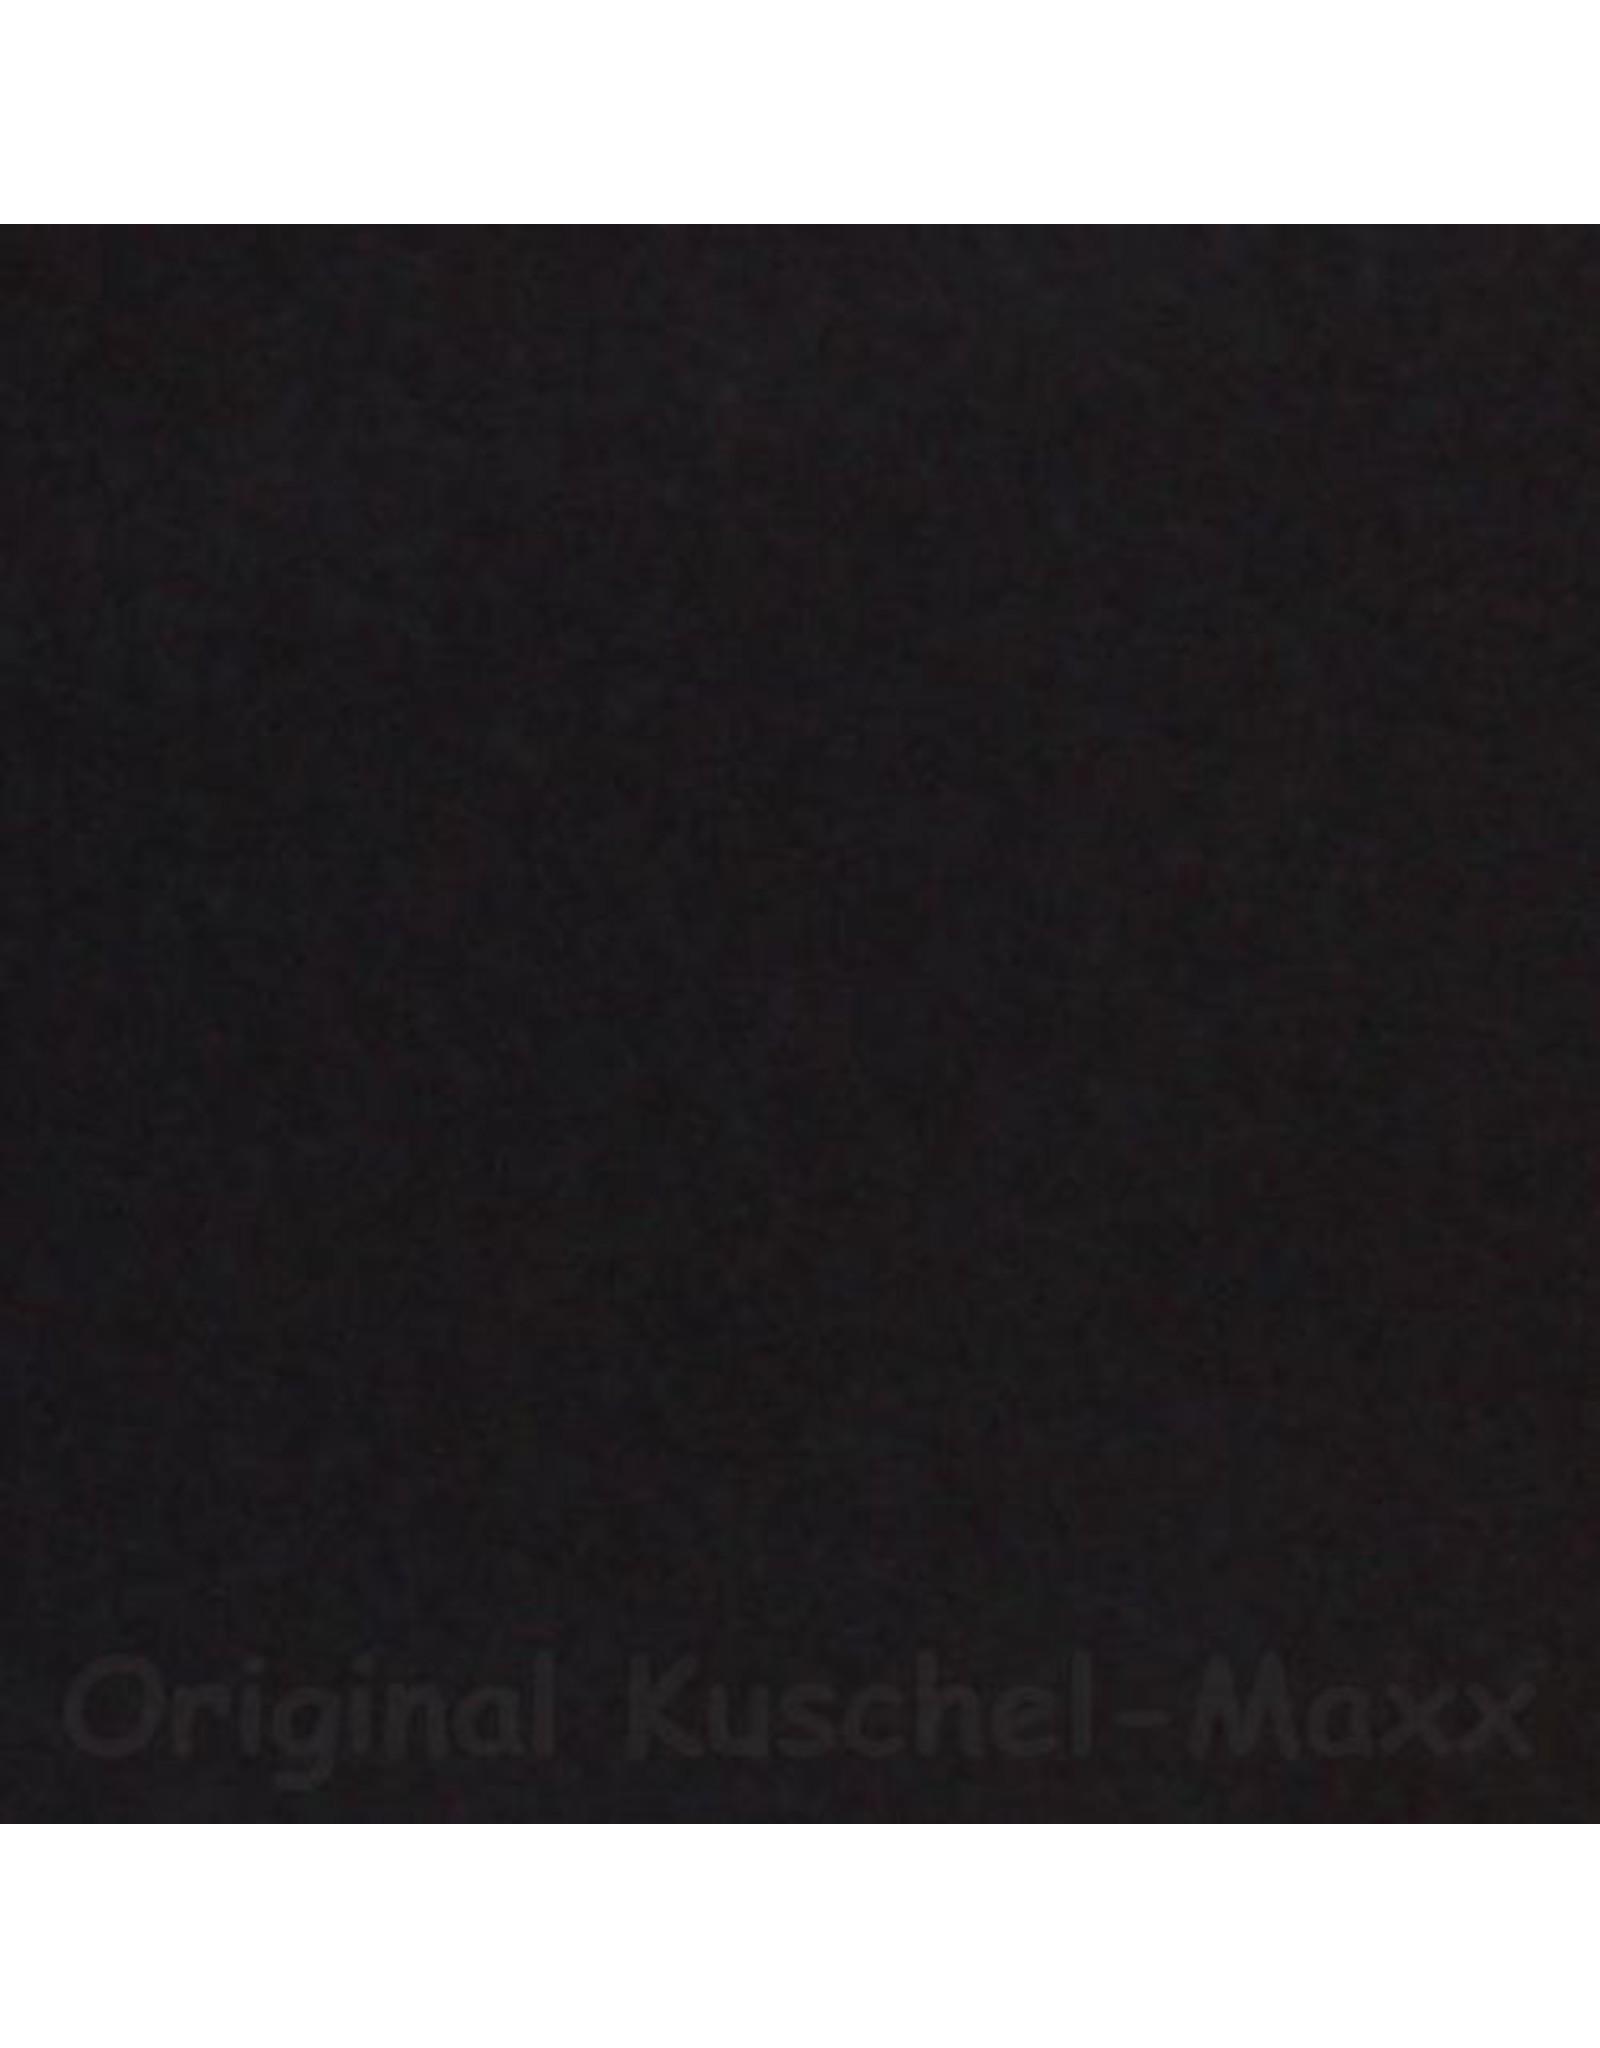 Kuschel-Maxx Kuschel-Maxx - Schwarz SIZE L